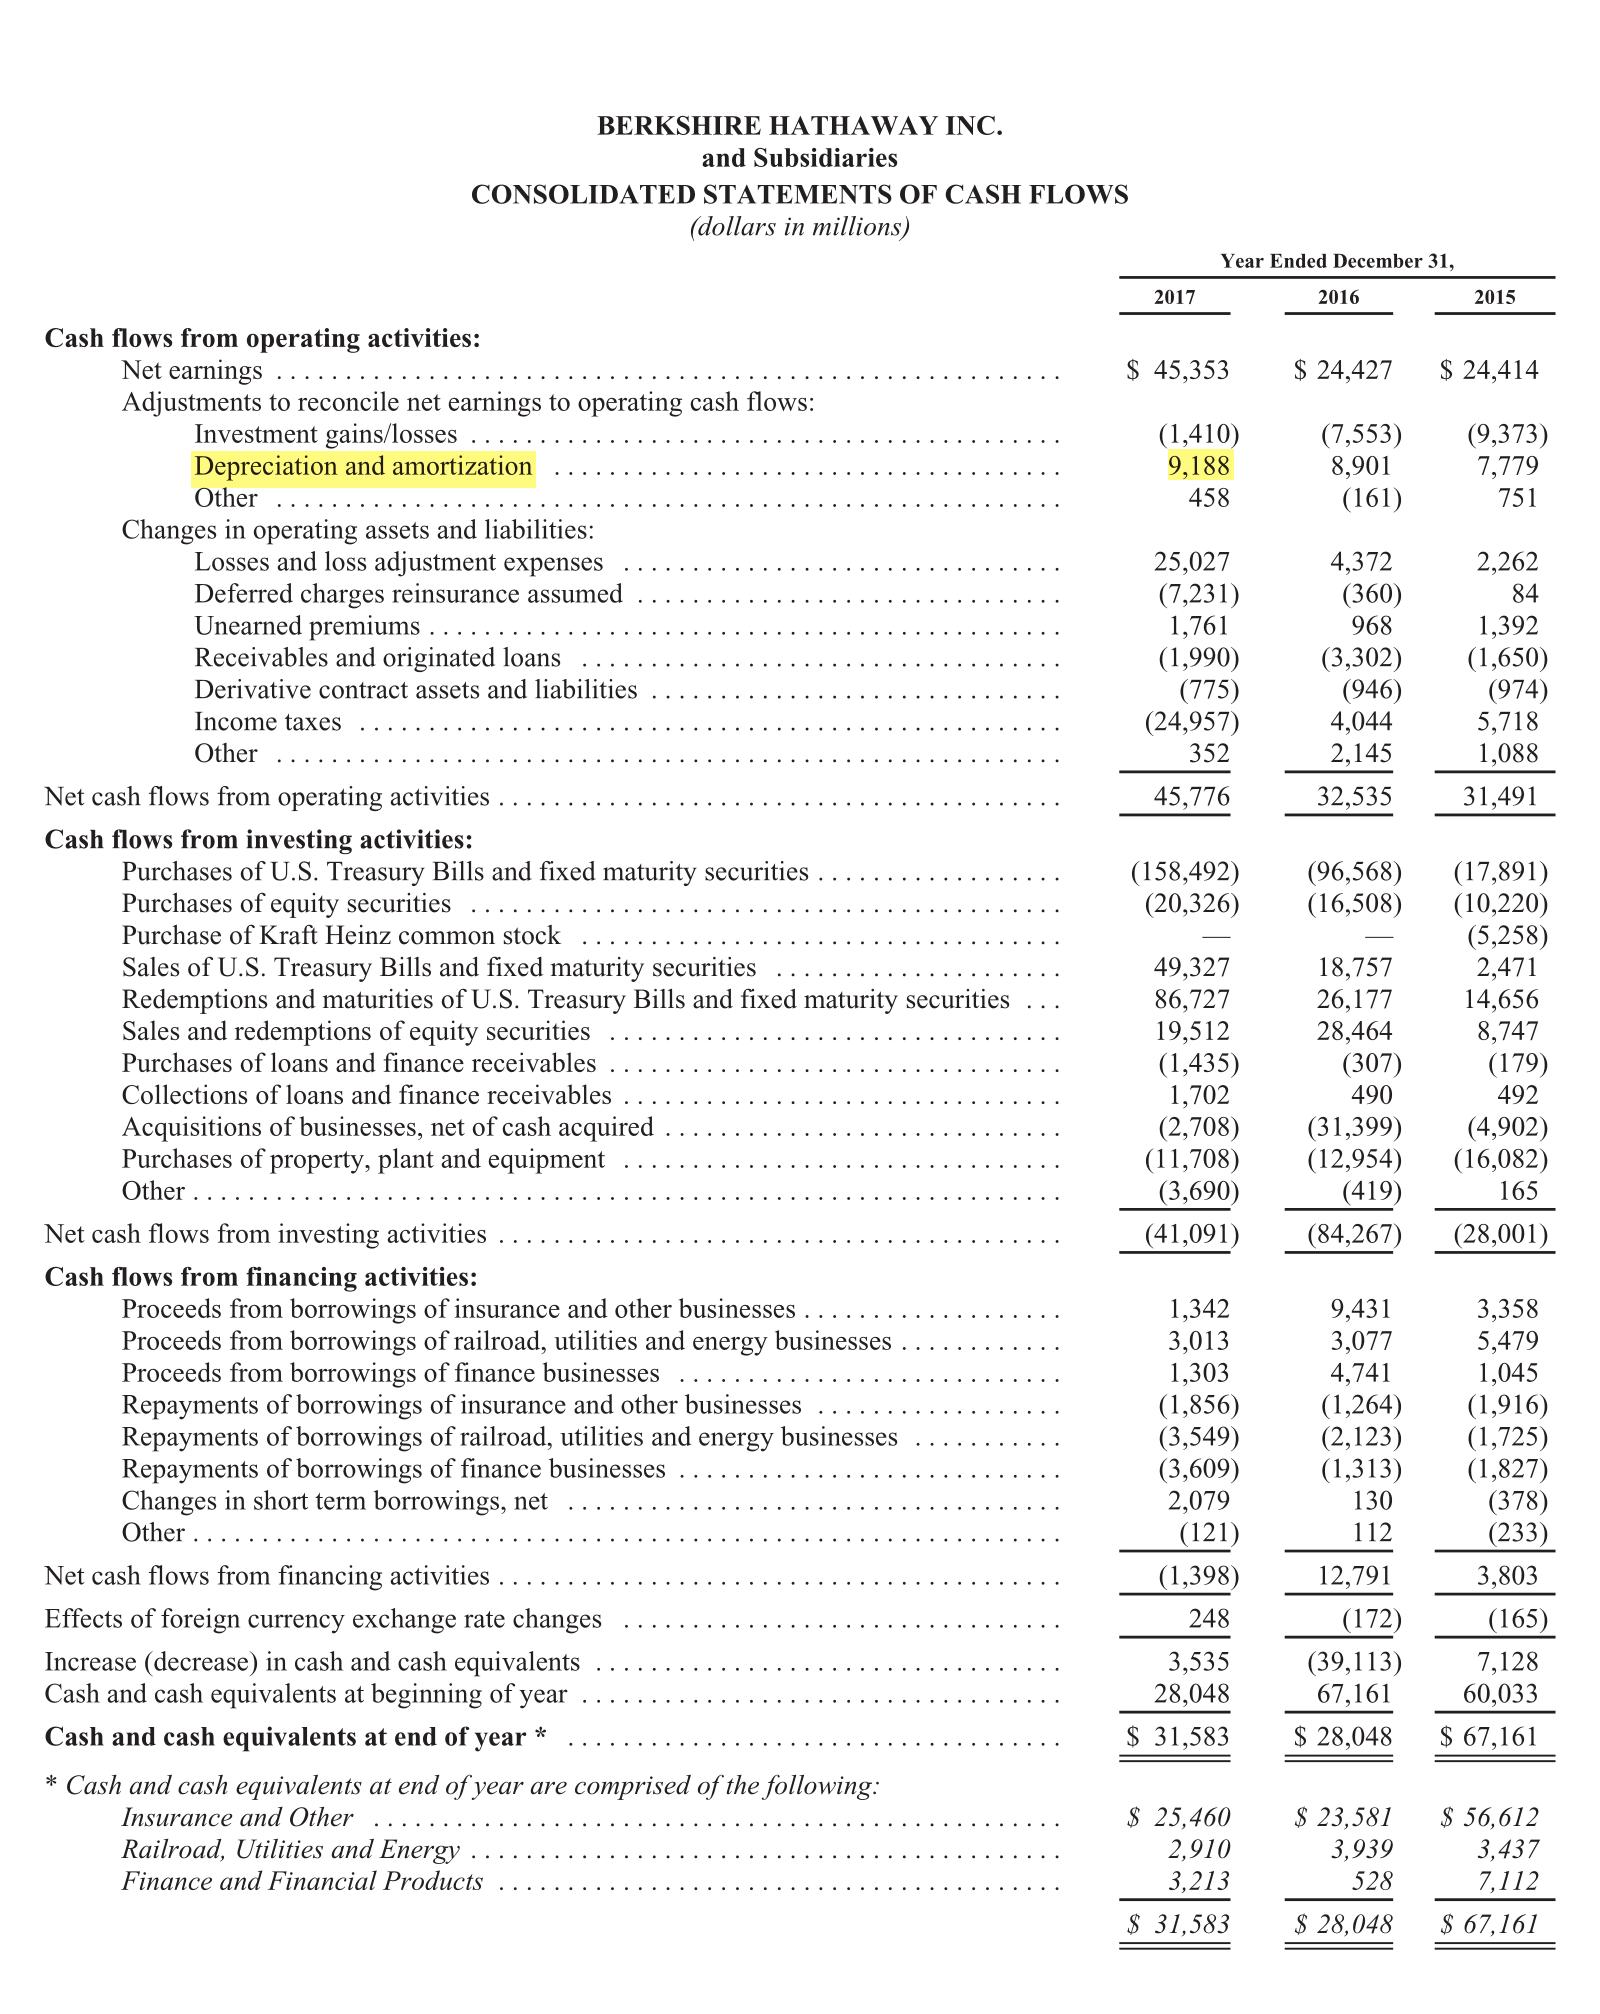 Страница 98 годового отчета Berkshire Hathaway за 2017 год